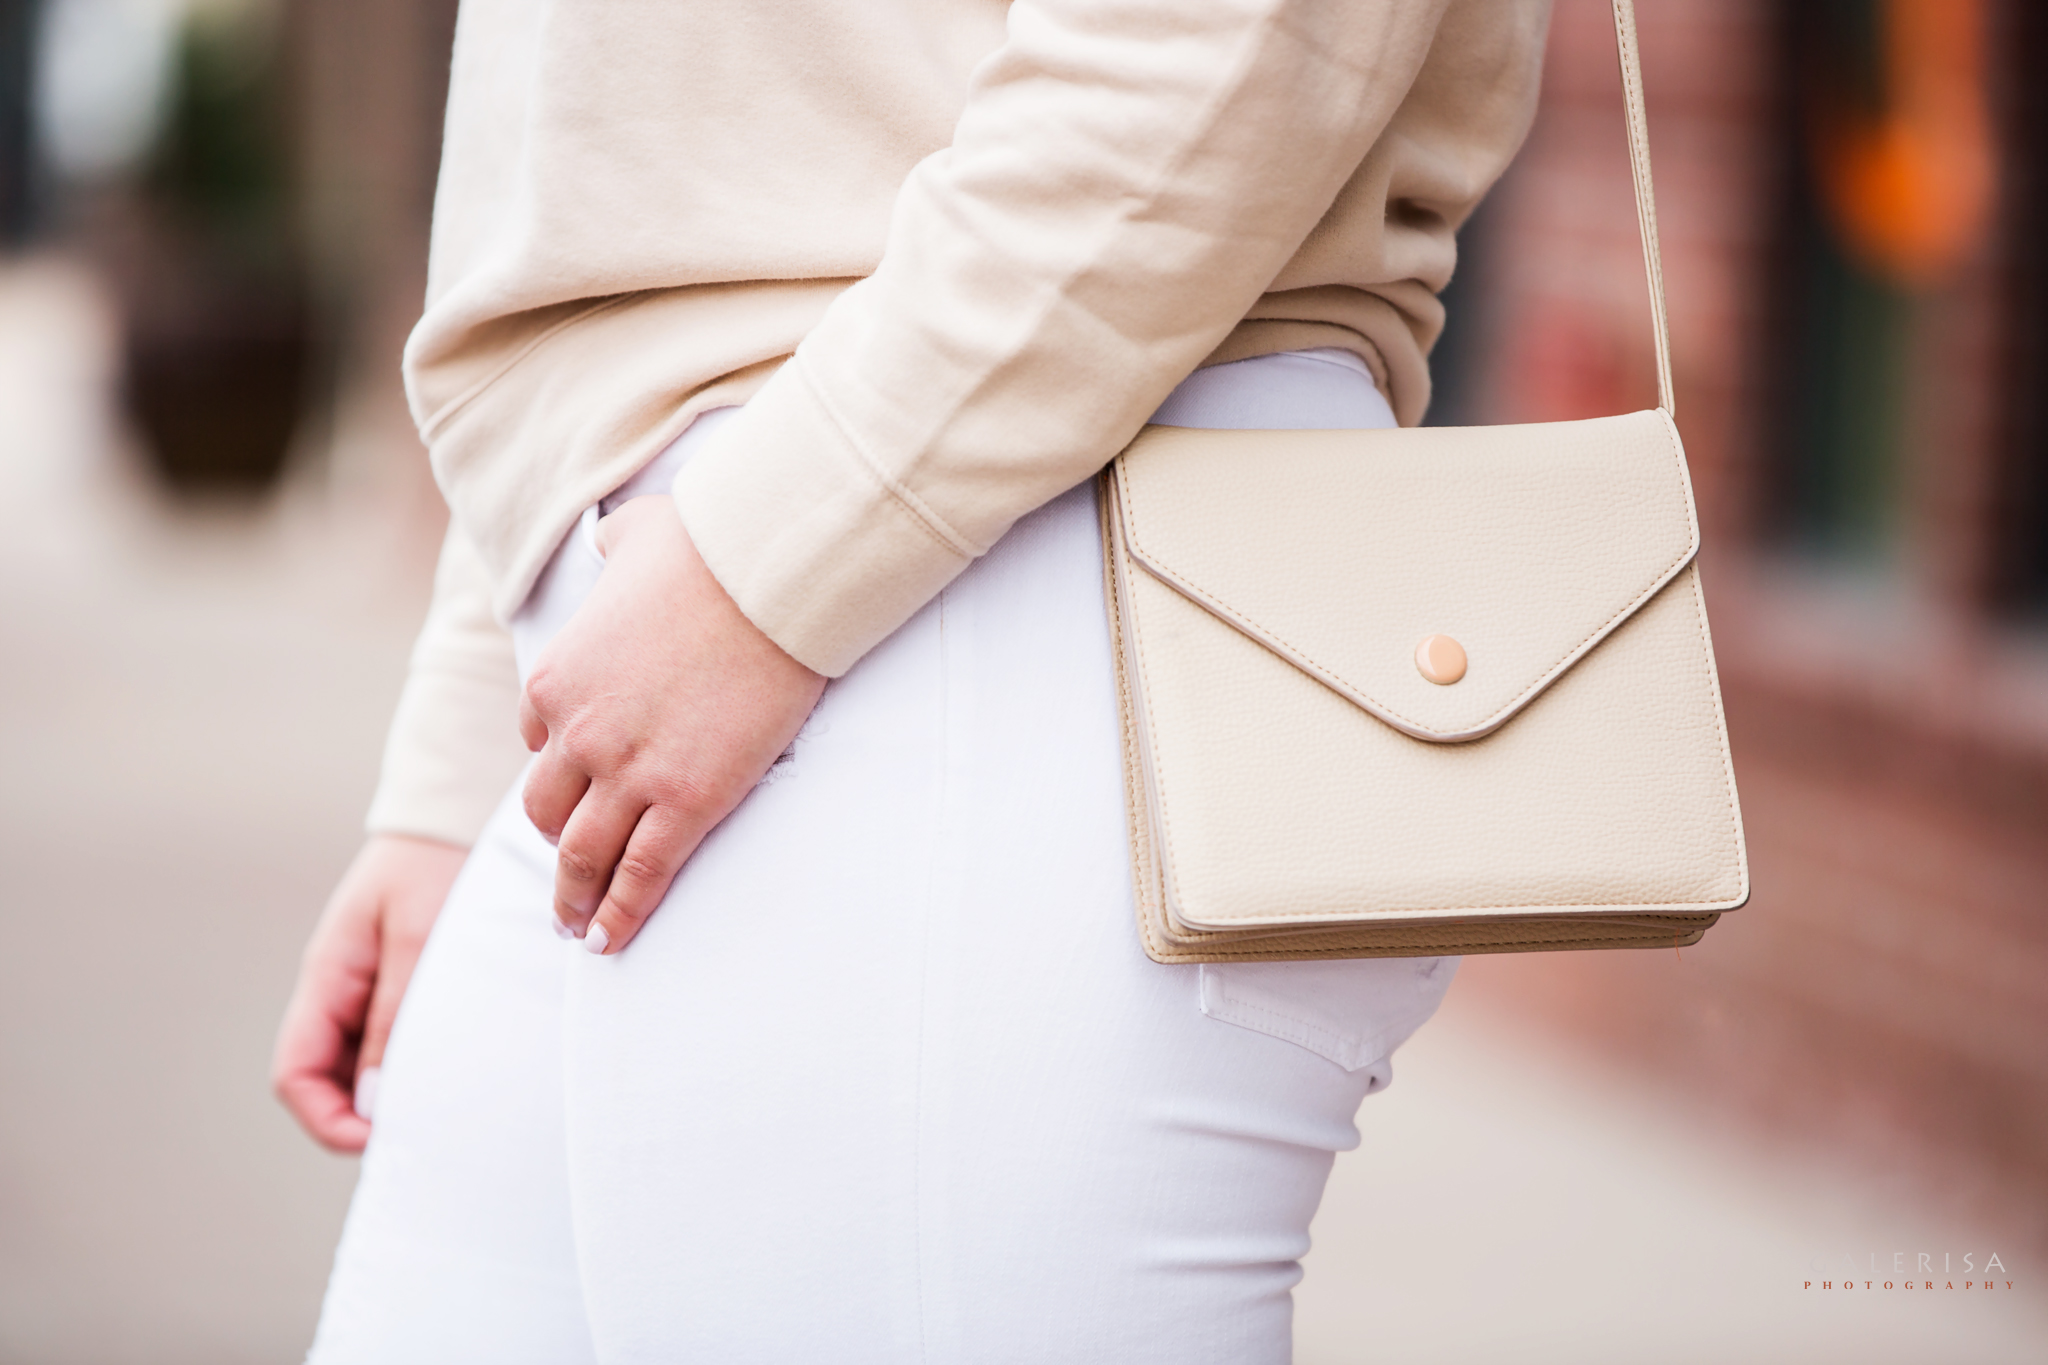 Raeann-Langas-Denver-Fashion-Blogger--white-pants-beige-sweater-GaleRisa-Photography-2016-37